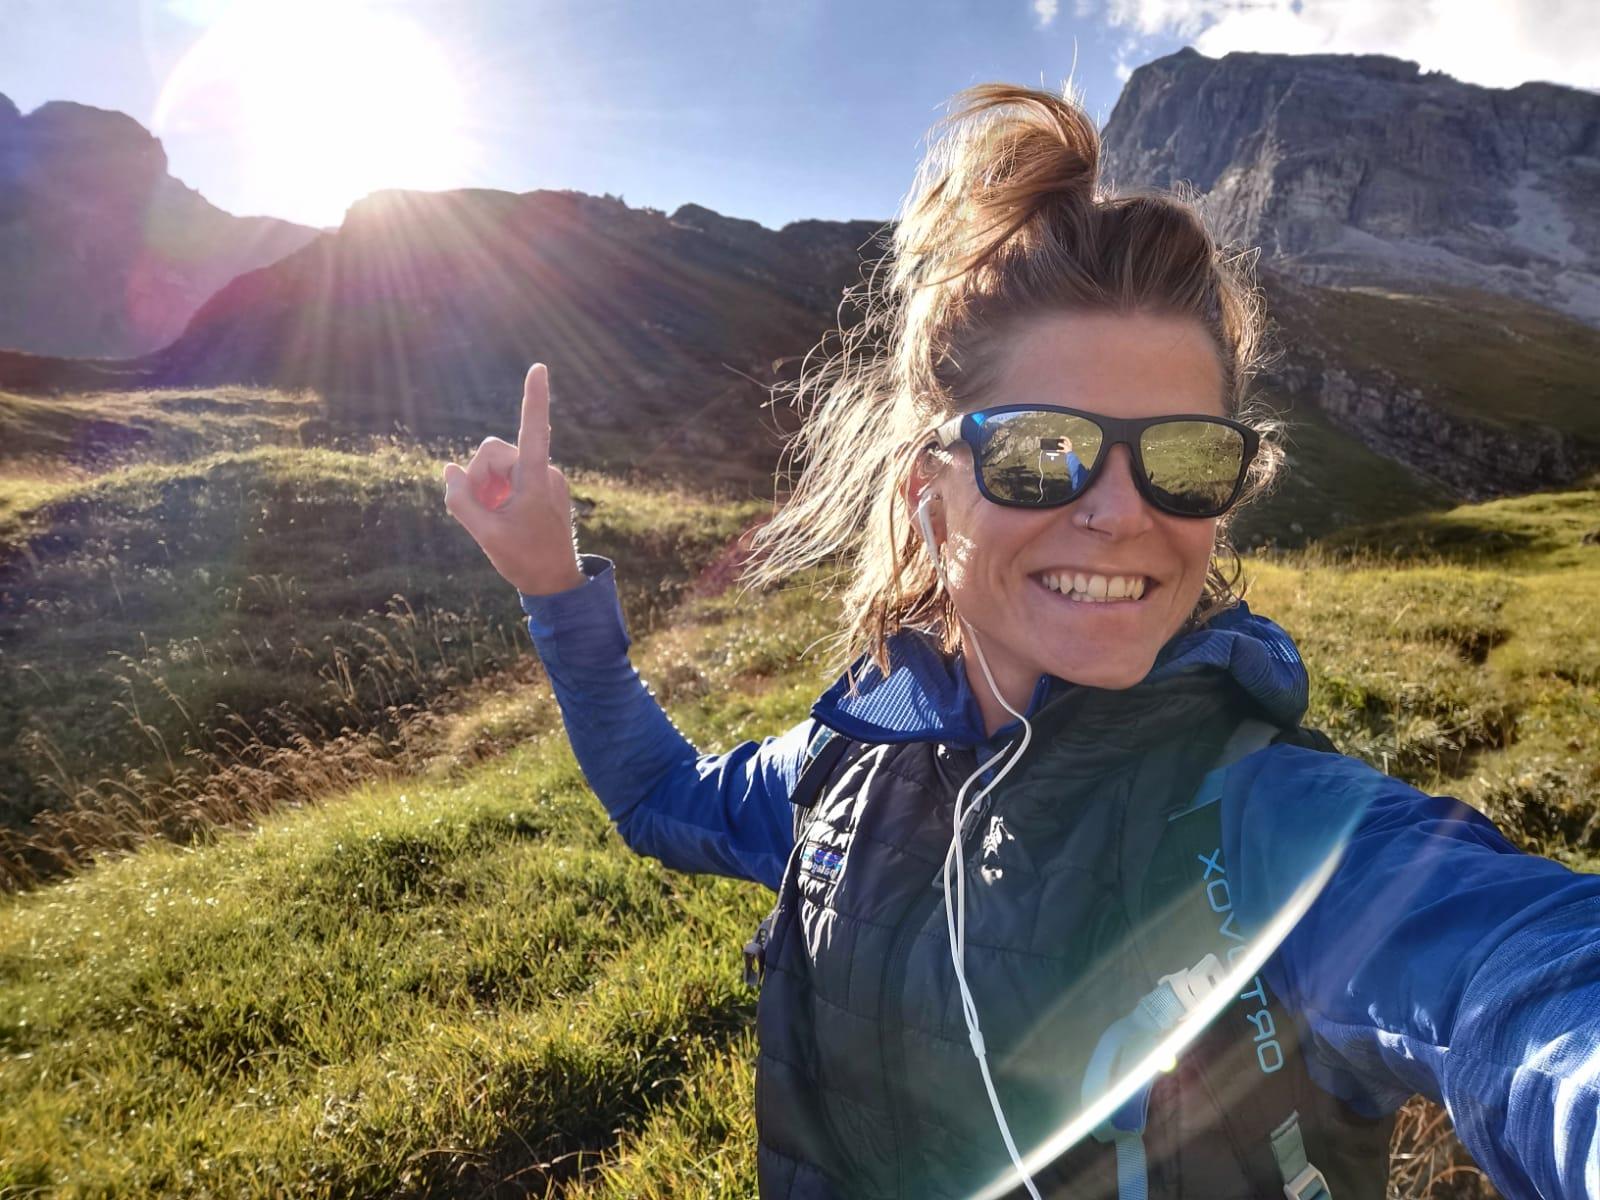 Sofia Muigg, Foto: Quirin Chalupar |Climbers Paradise